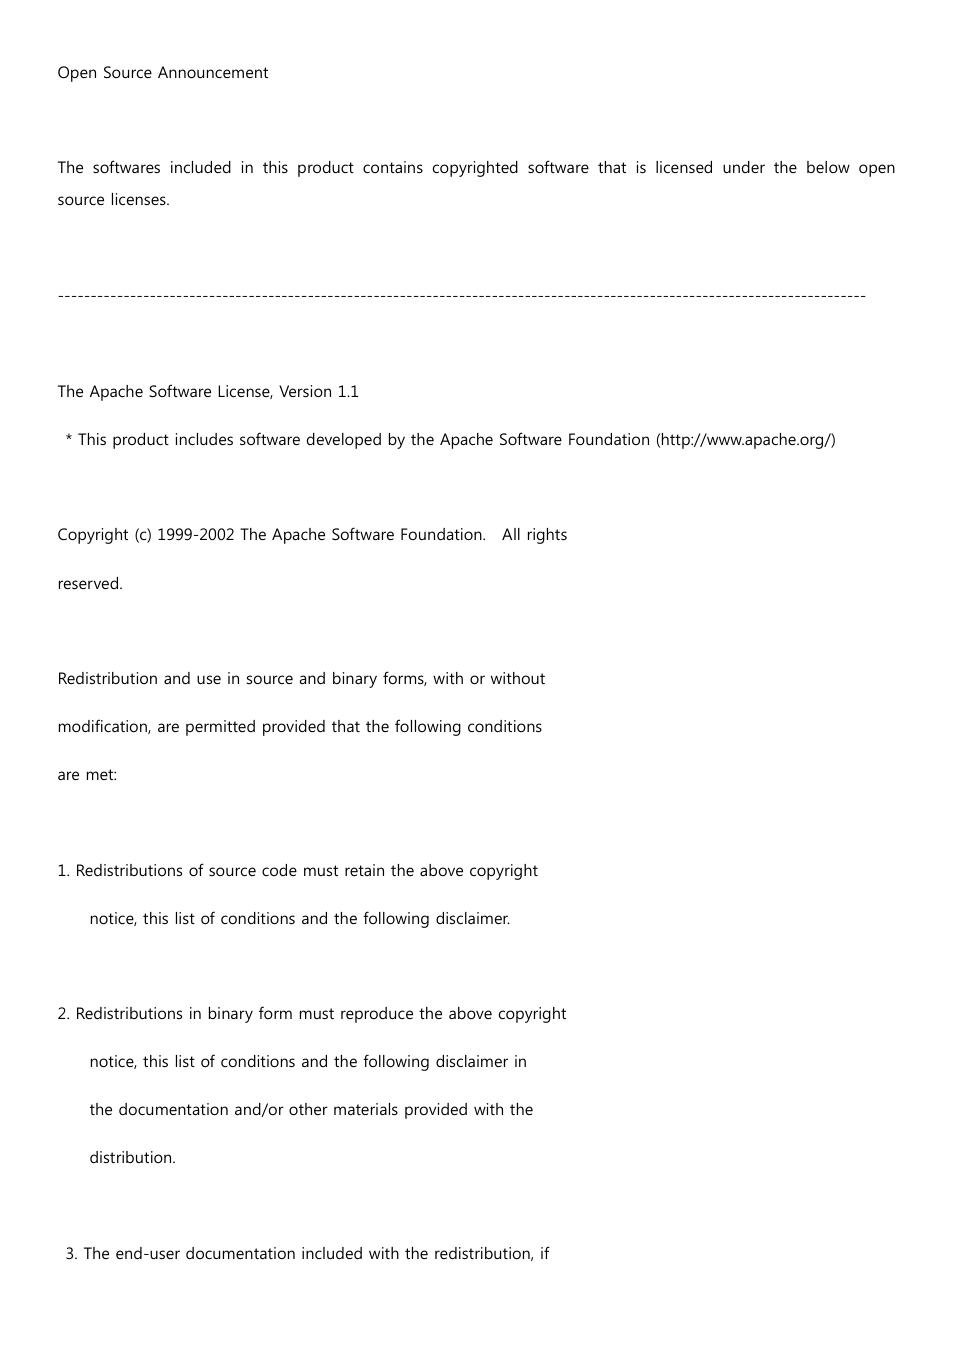 Samsung SL-M2020W-XAA User Manual | 153 pages